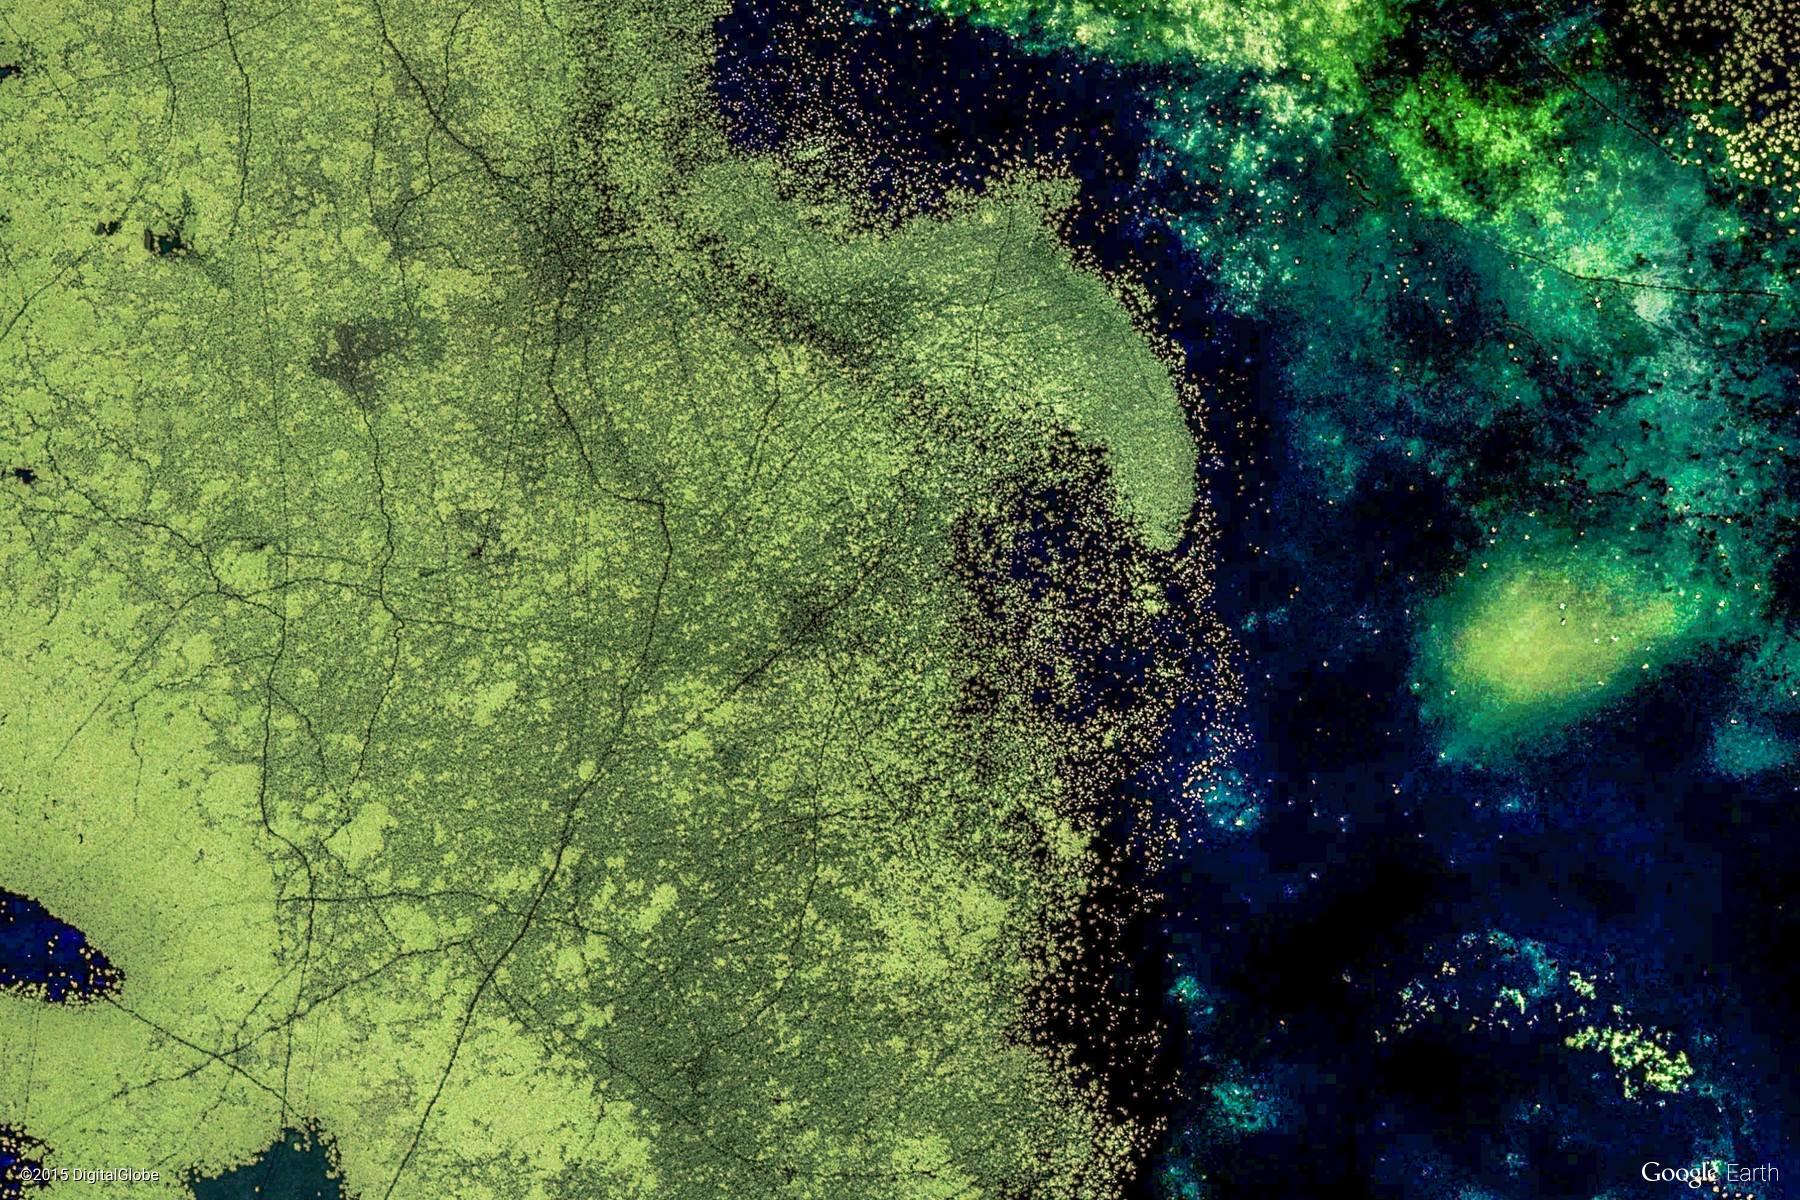 4Ggoogle-earth-view-6495.jpg